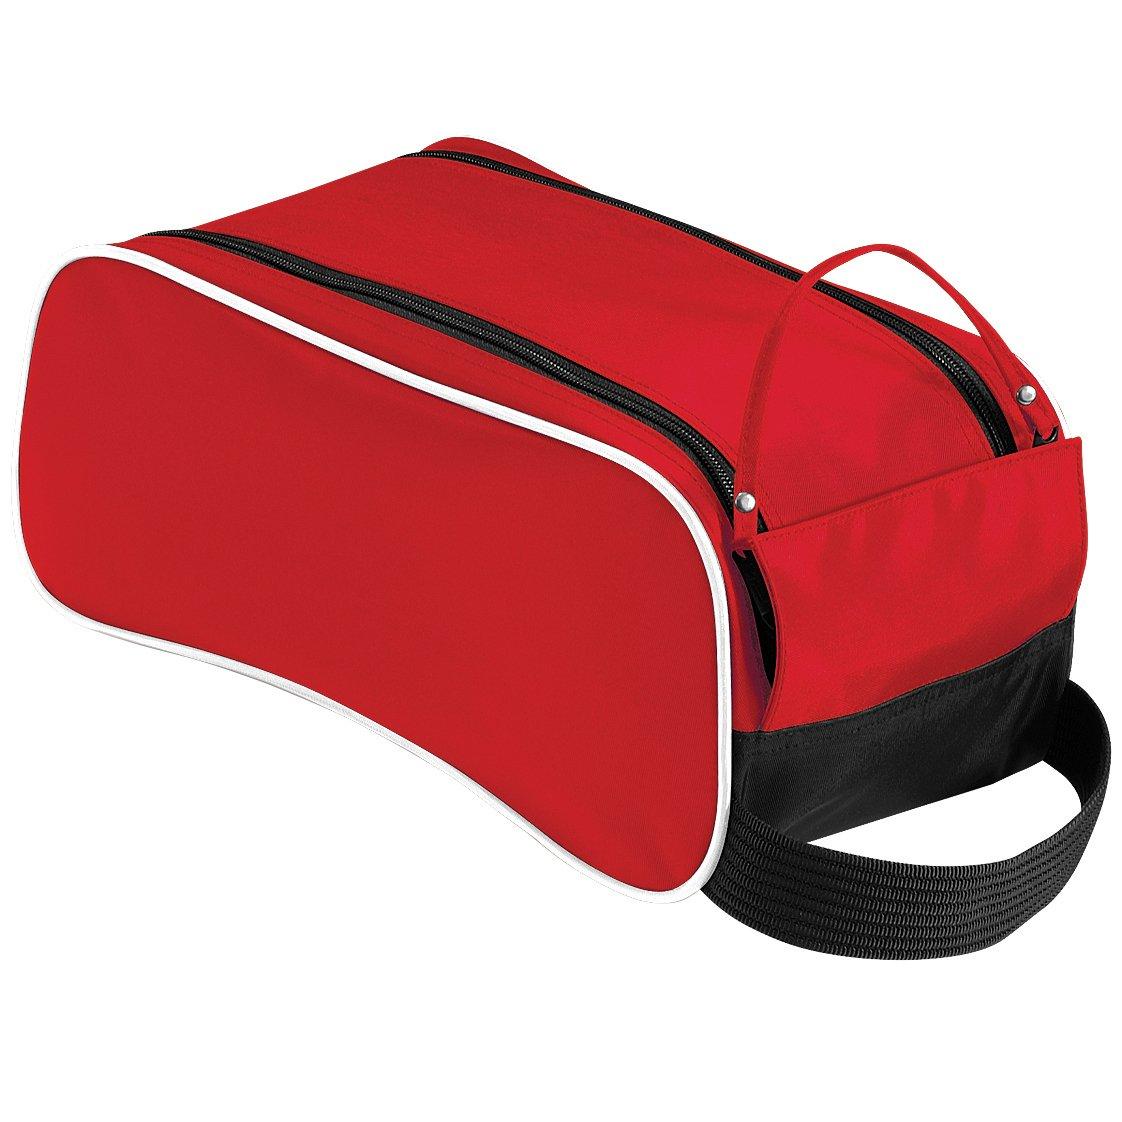 Pack of 2 Quadra Teamwear Shoe Bag 9 Liters